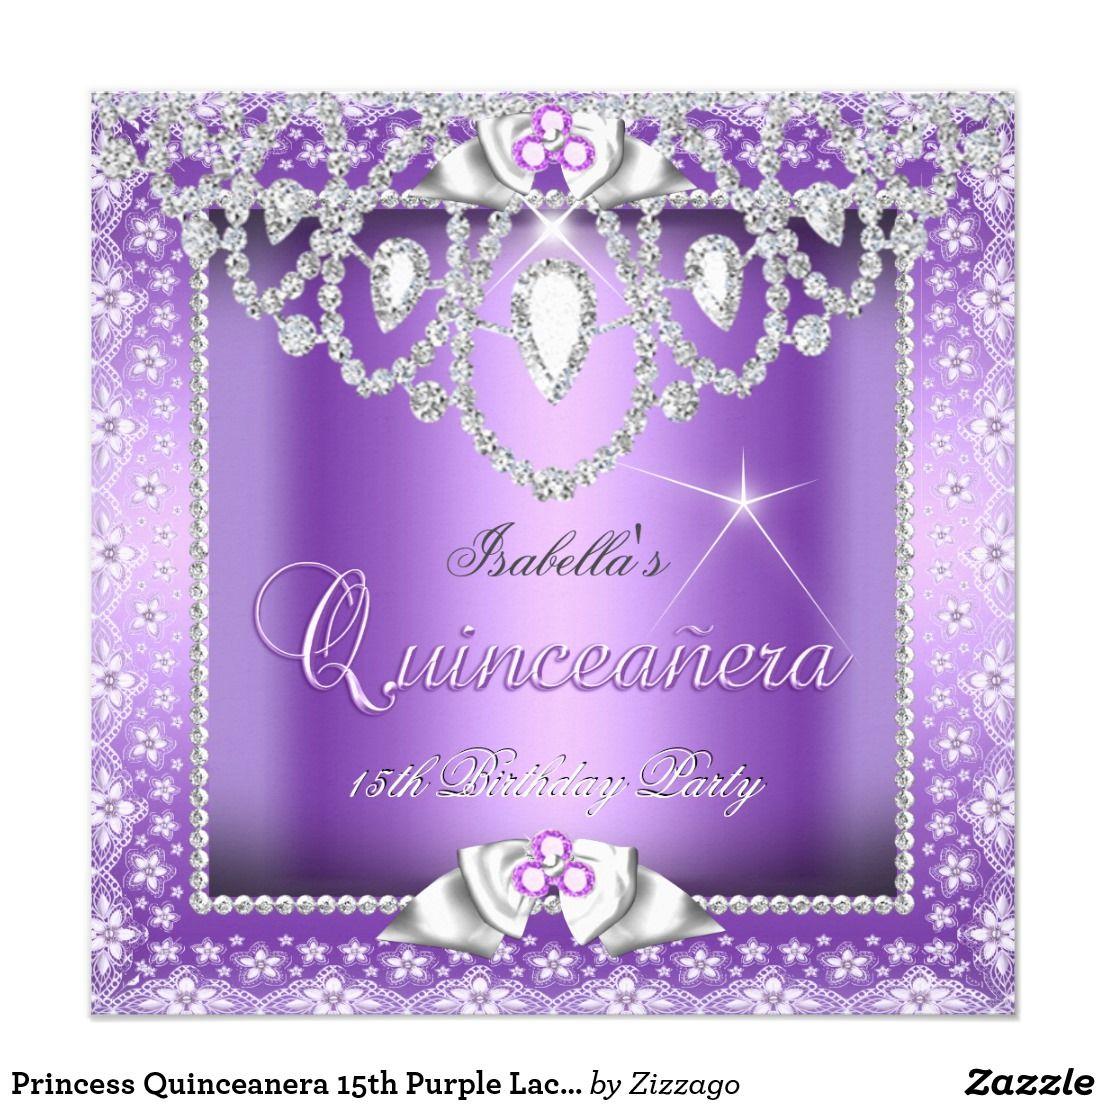 Princess Quinceanera 15th Purple Lace Diamond Card   15th birthday ...